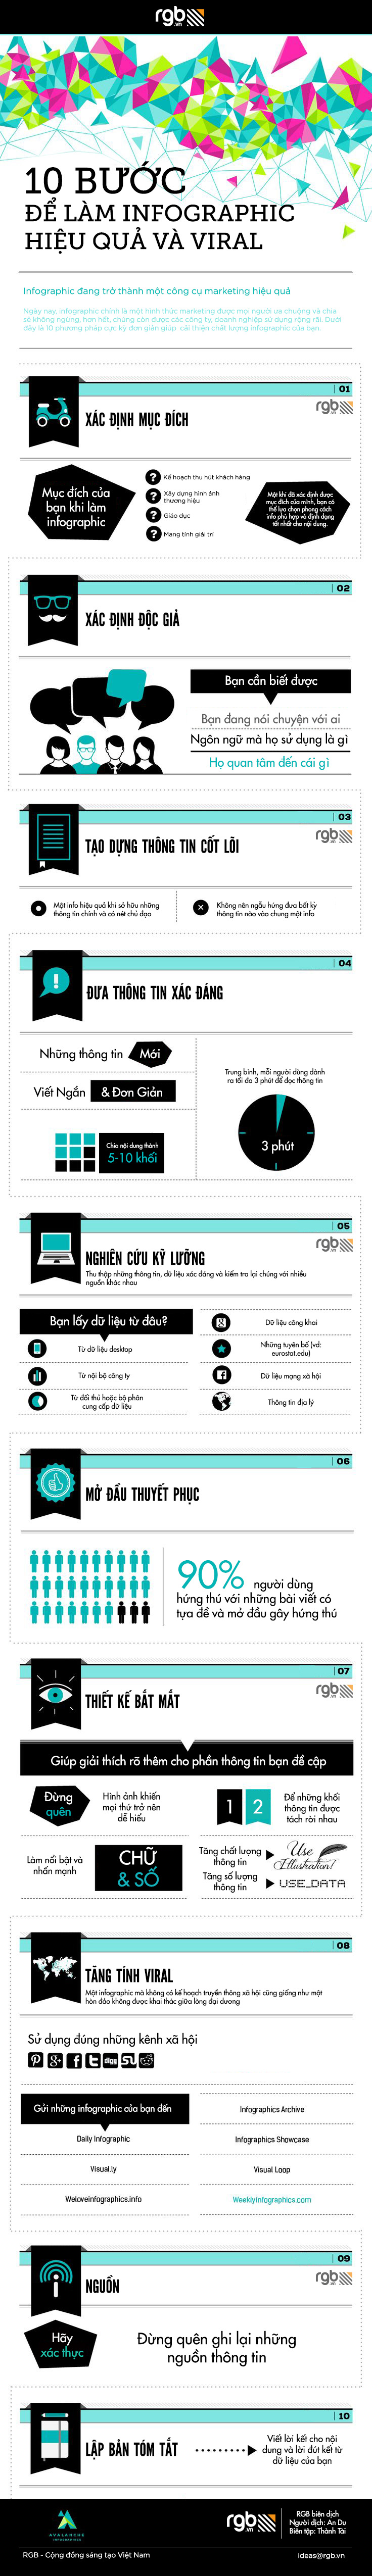 rgb-10-buoc-de-lam-infographic